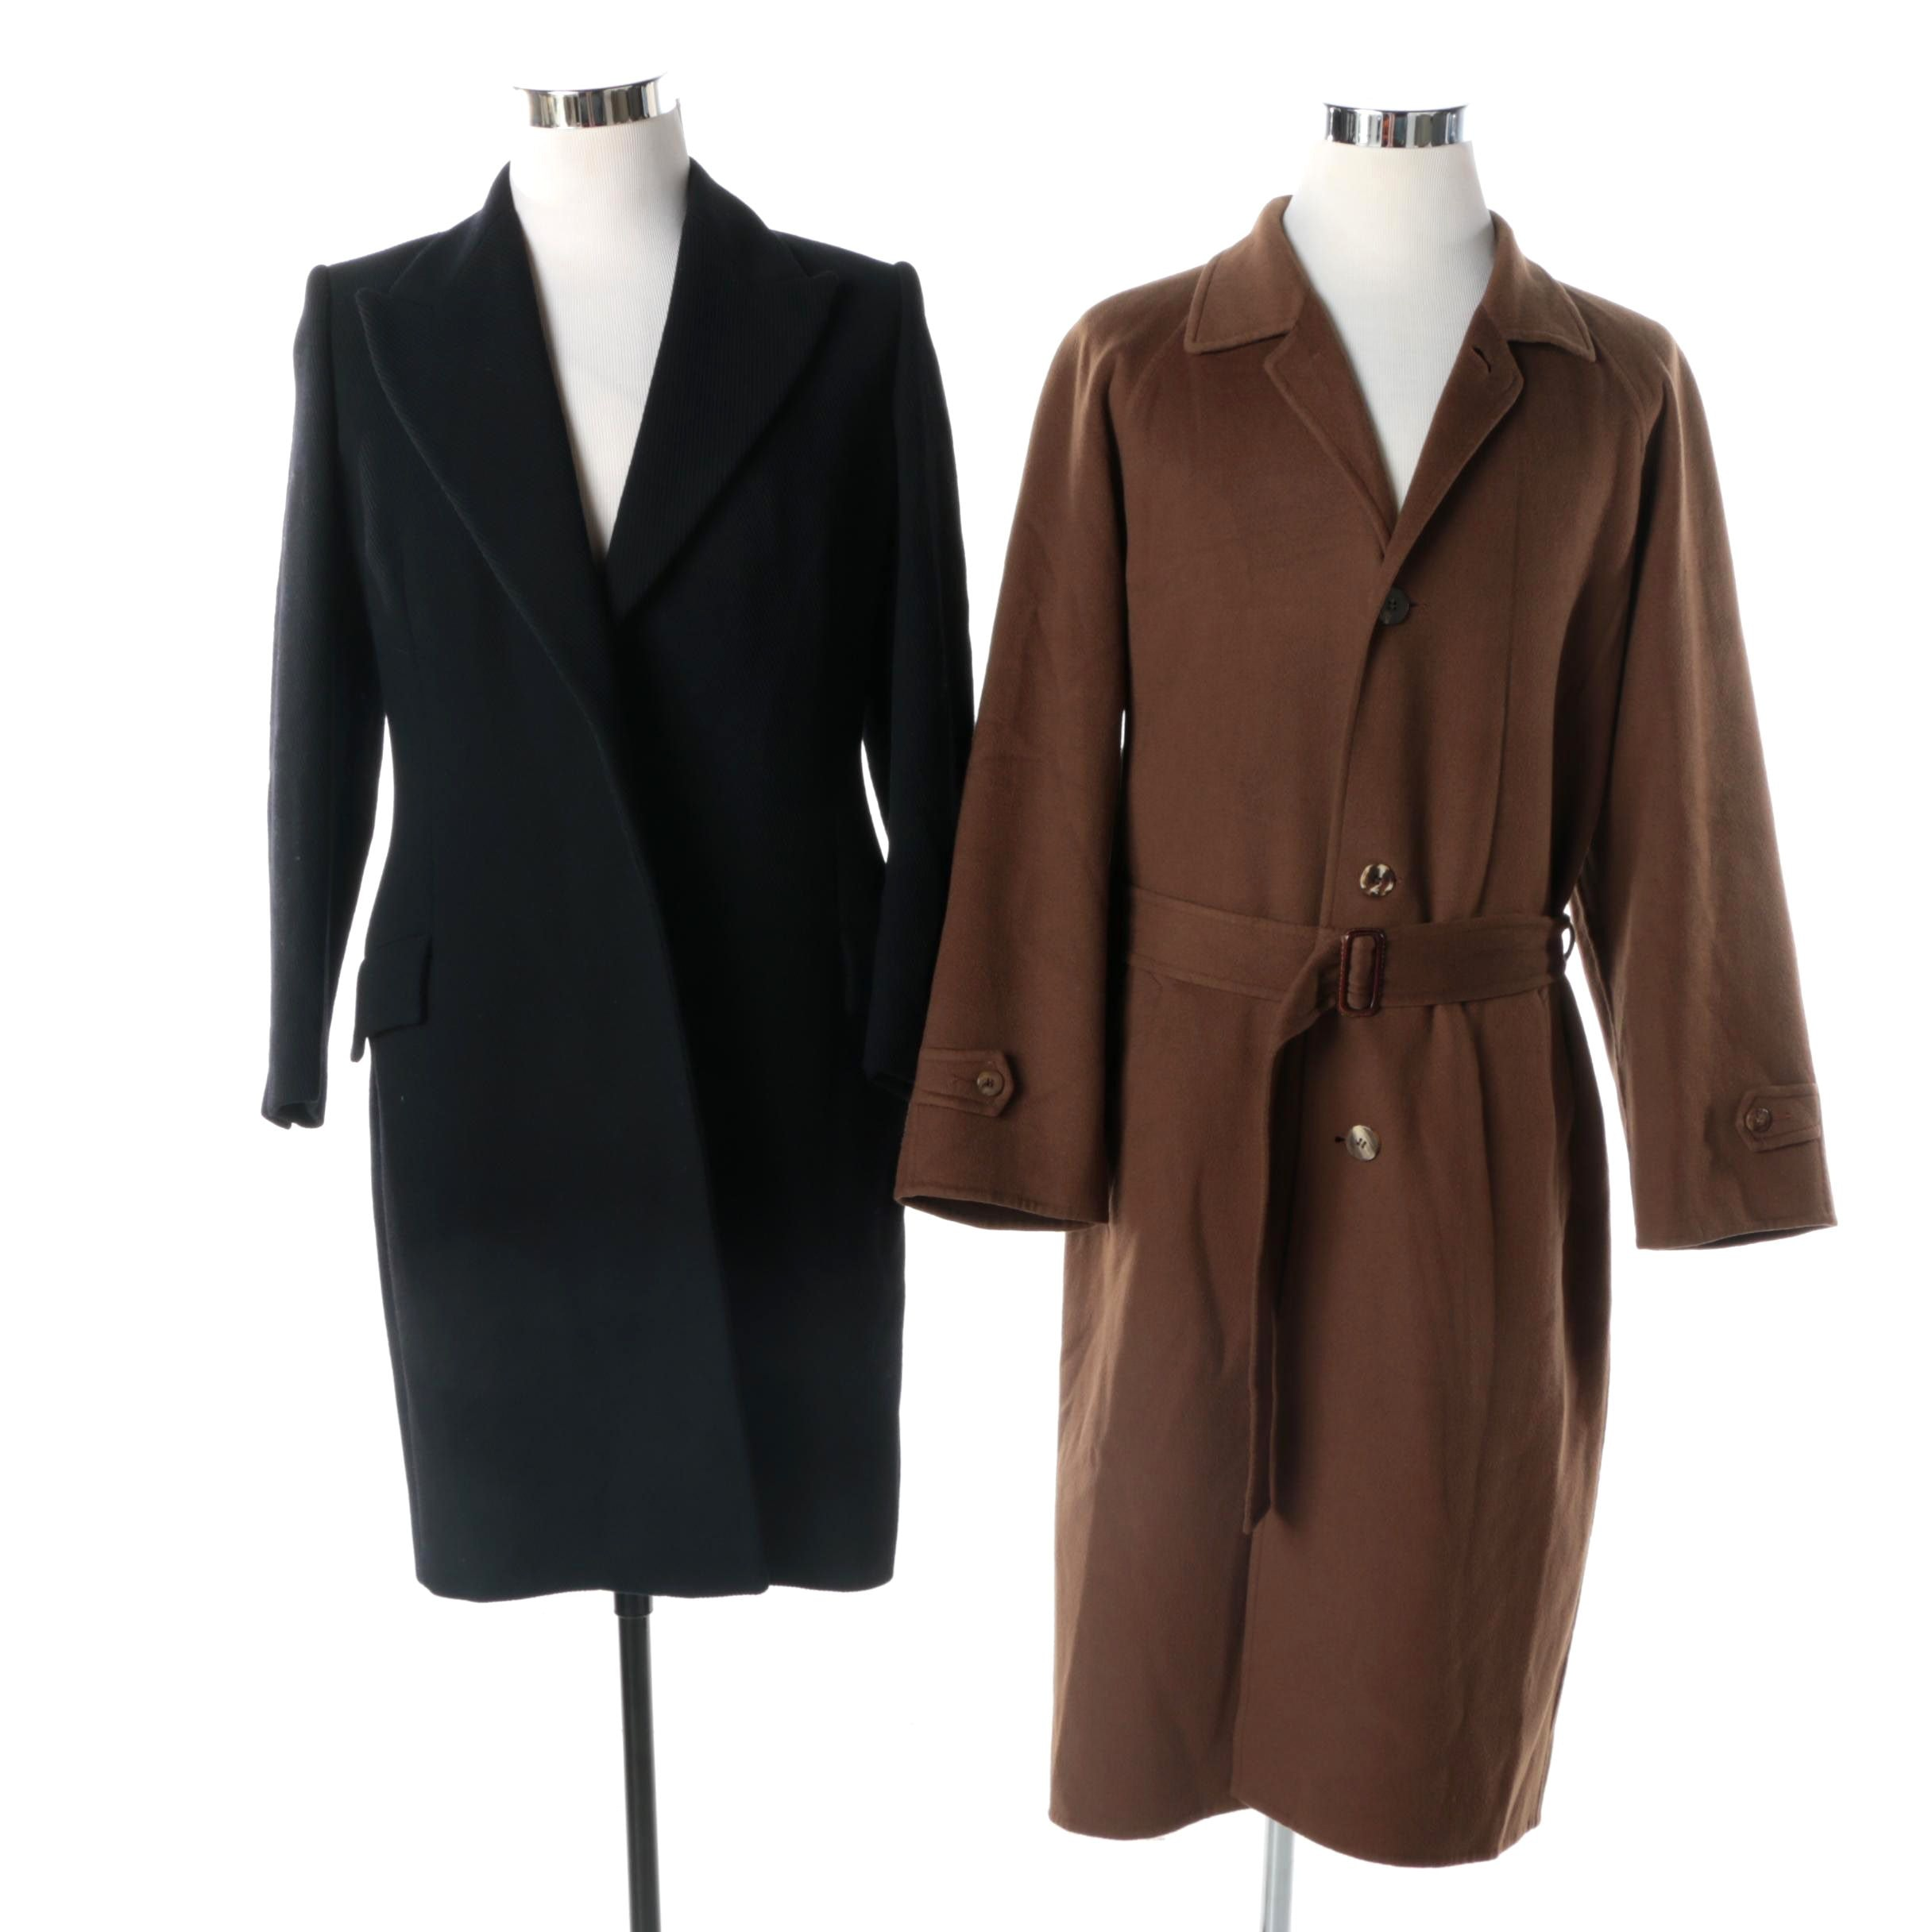 Men's Salvatore Ferragamo Cashmere Coat and Women's Versace Classic Wool Coat